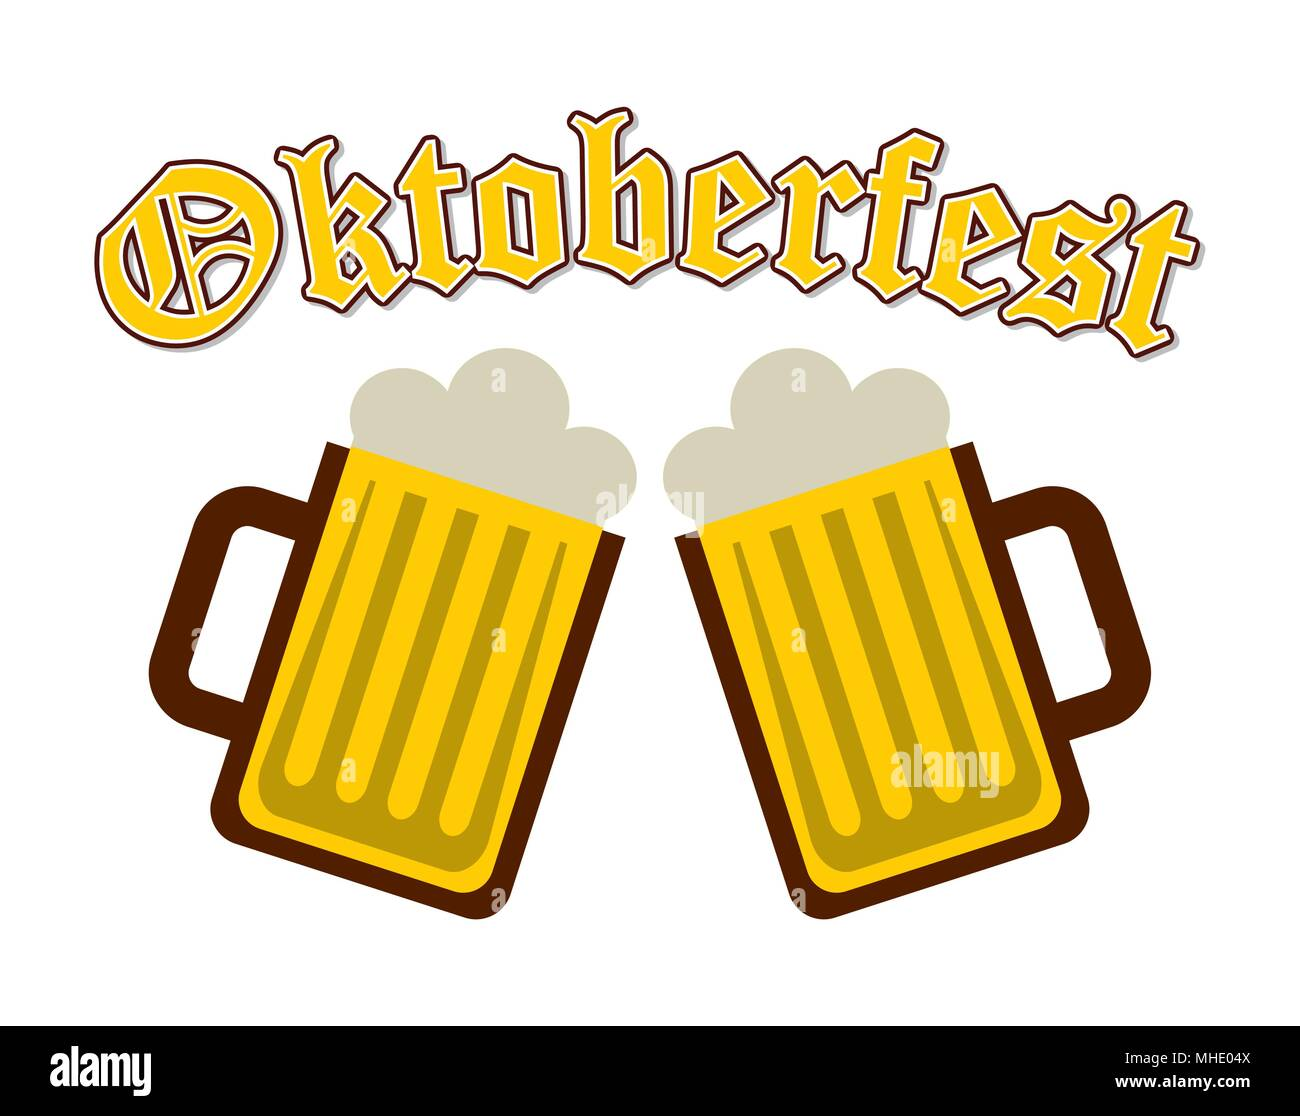 welcome oktoberfest  - Stock Image